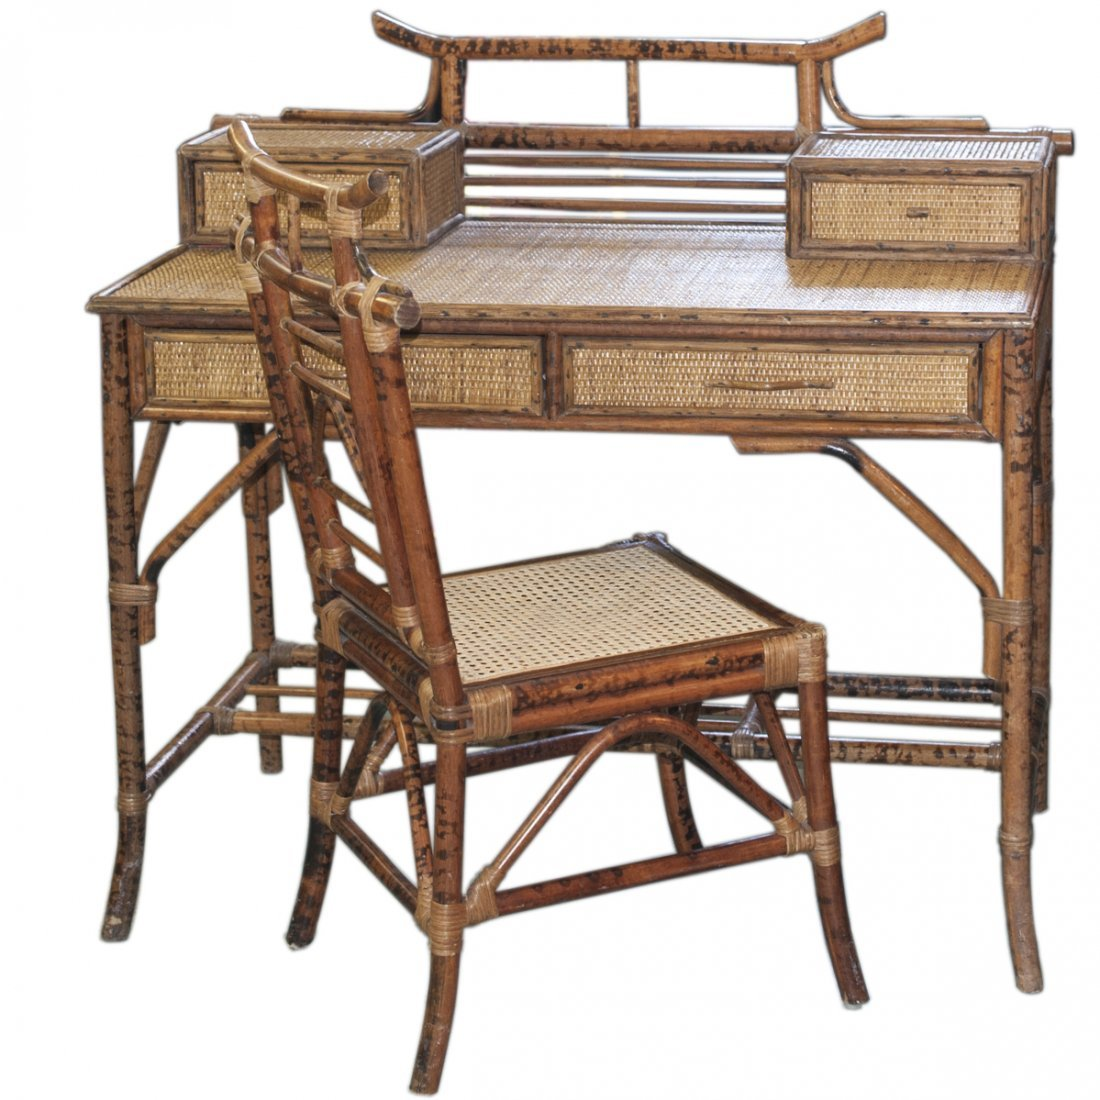 Vintage Wicker & Bamboo Furniture Set - 7